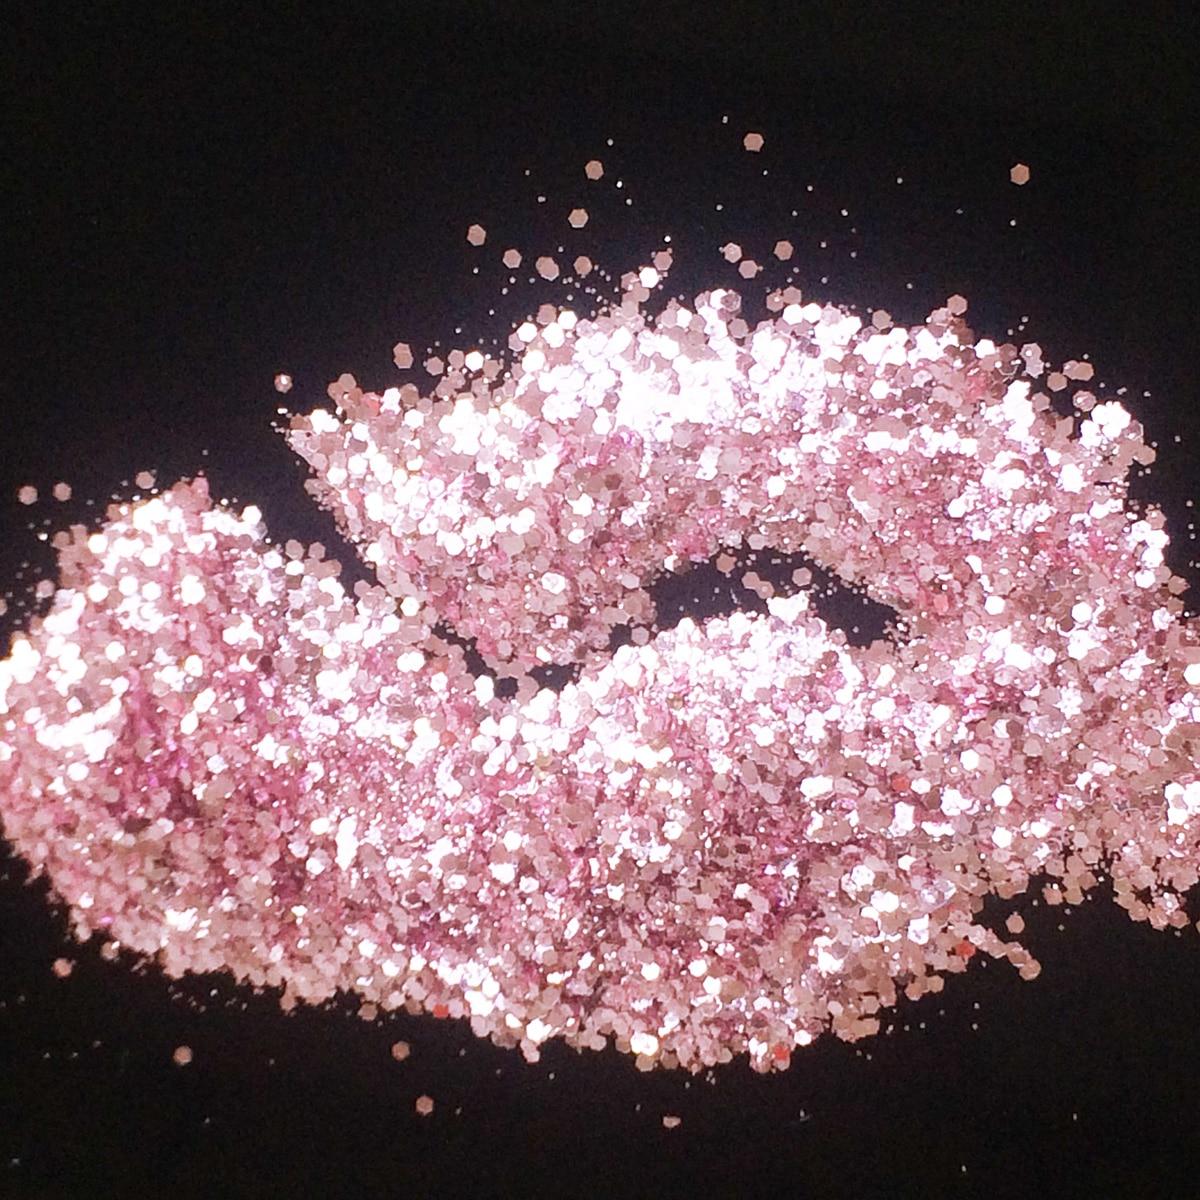 Pearl Pink Glitter Mix Size Nail Art Glitter Powder Hexagon Flakes UV Nail Glitter Powder Acrylic 3D Nail Dust Sequins rhombus star dot silver sequins сияющие хлопья украшение charm nail glitter пайетт декор макияж аксессуары